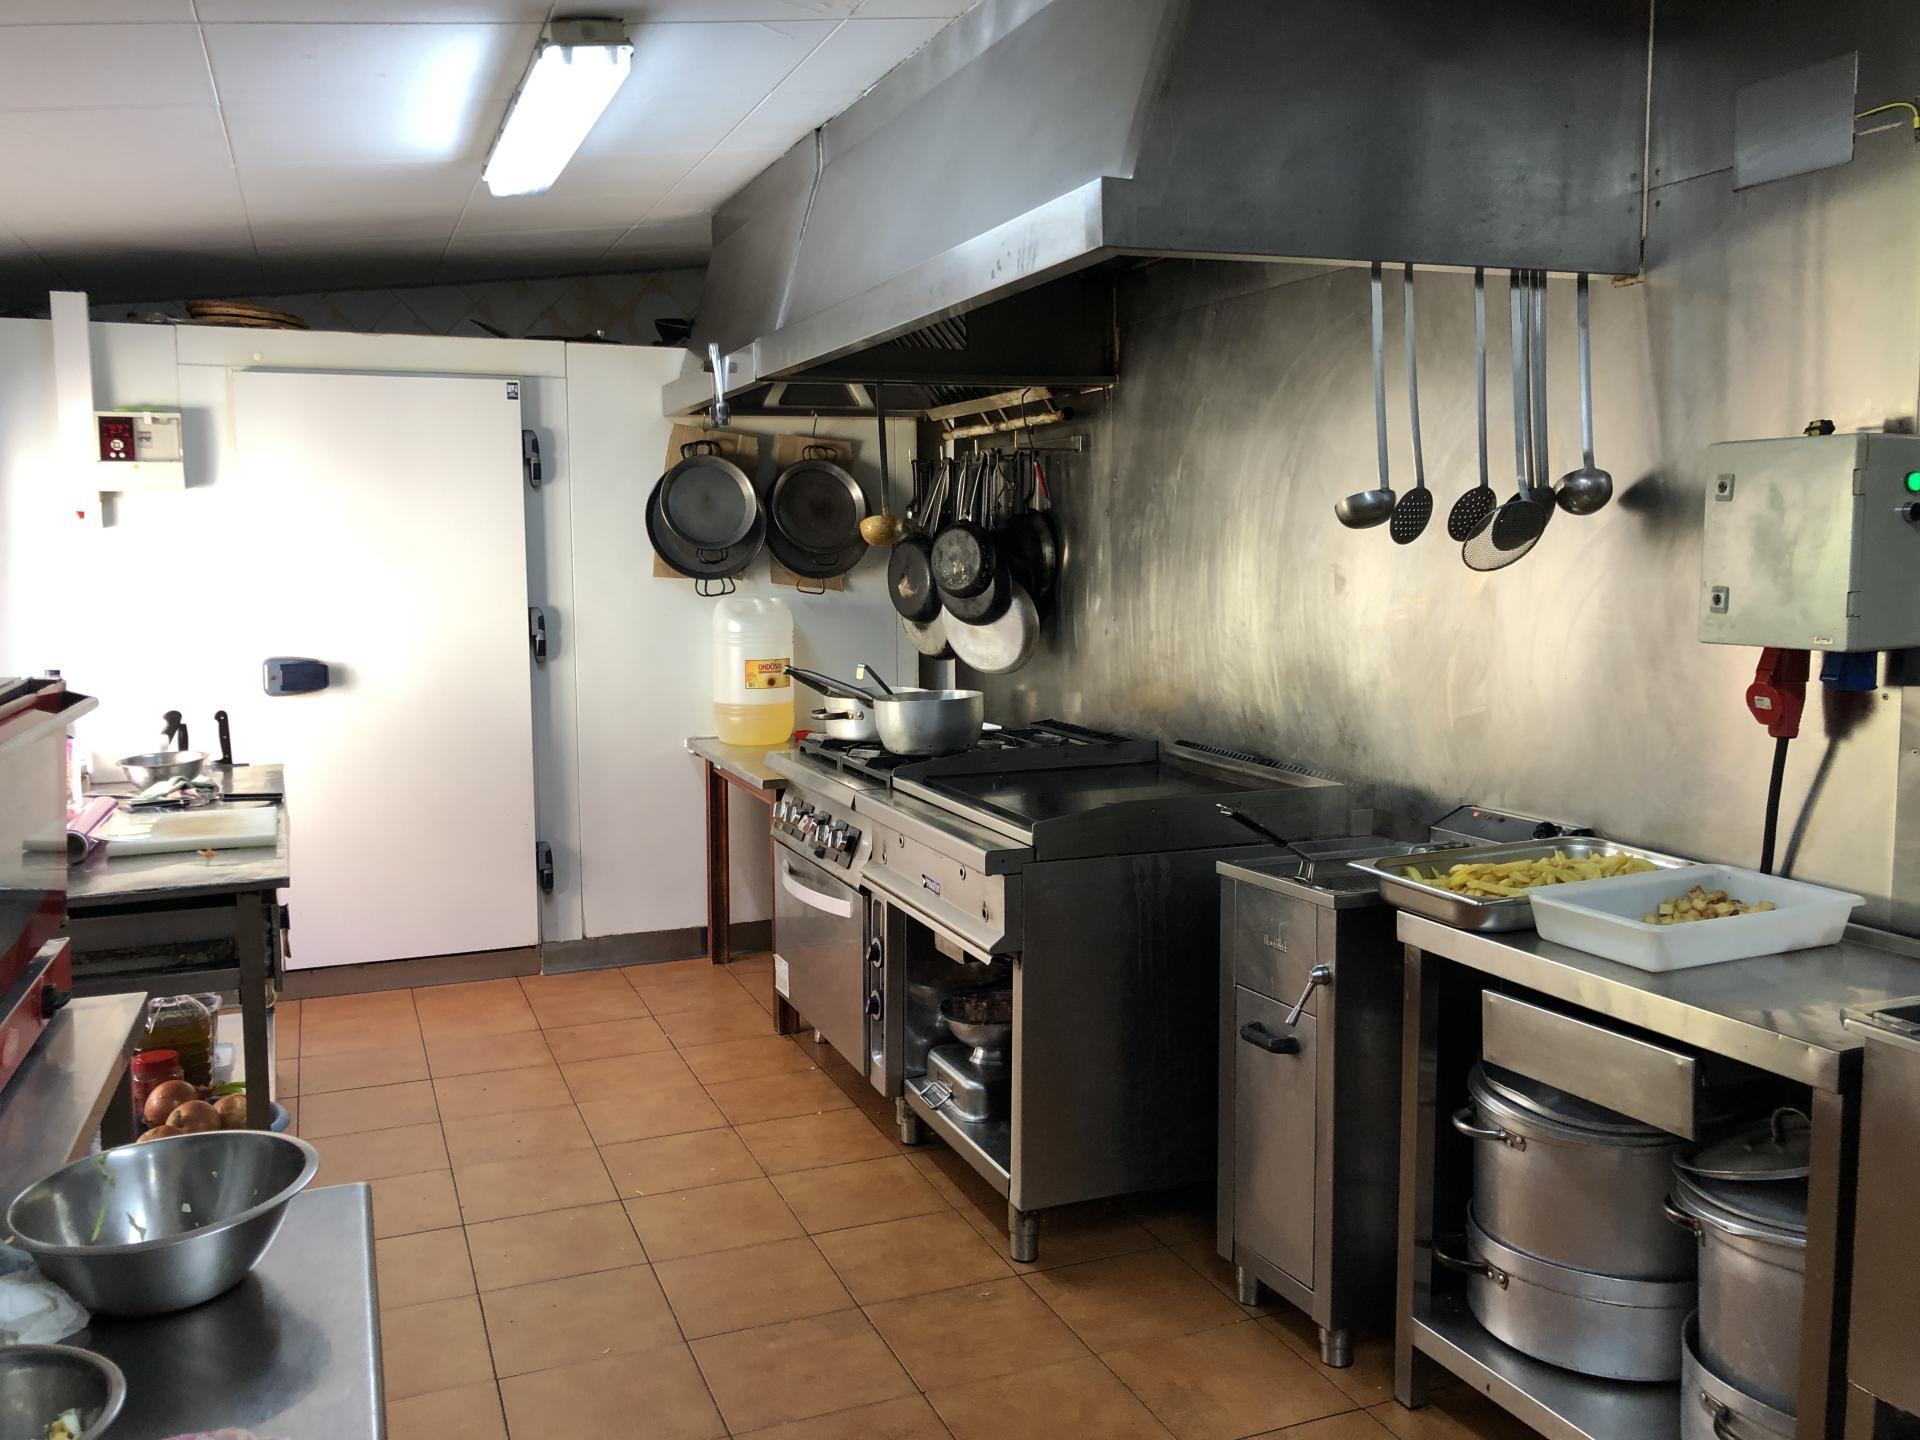 Foto 7 (V-735-2021) - Inmueble en  Venda a Santa Margarida i els Monjos